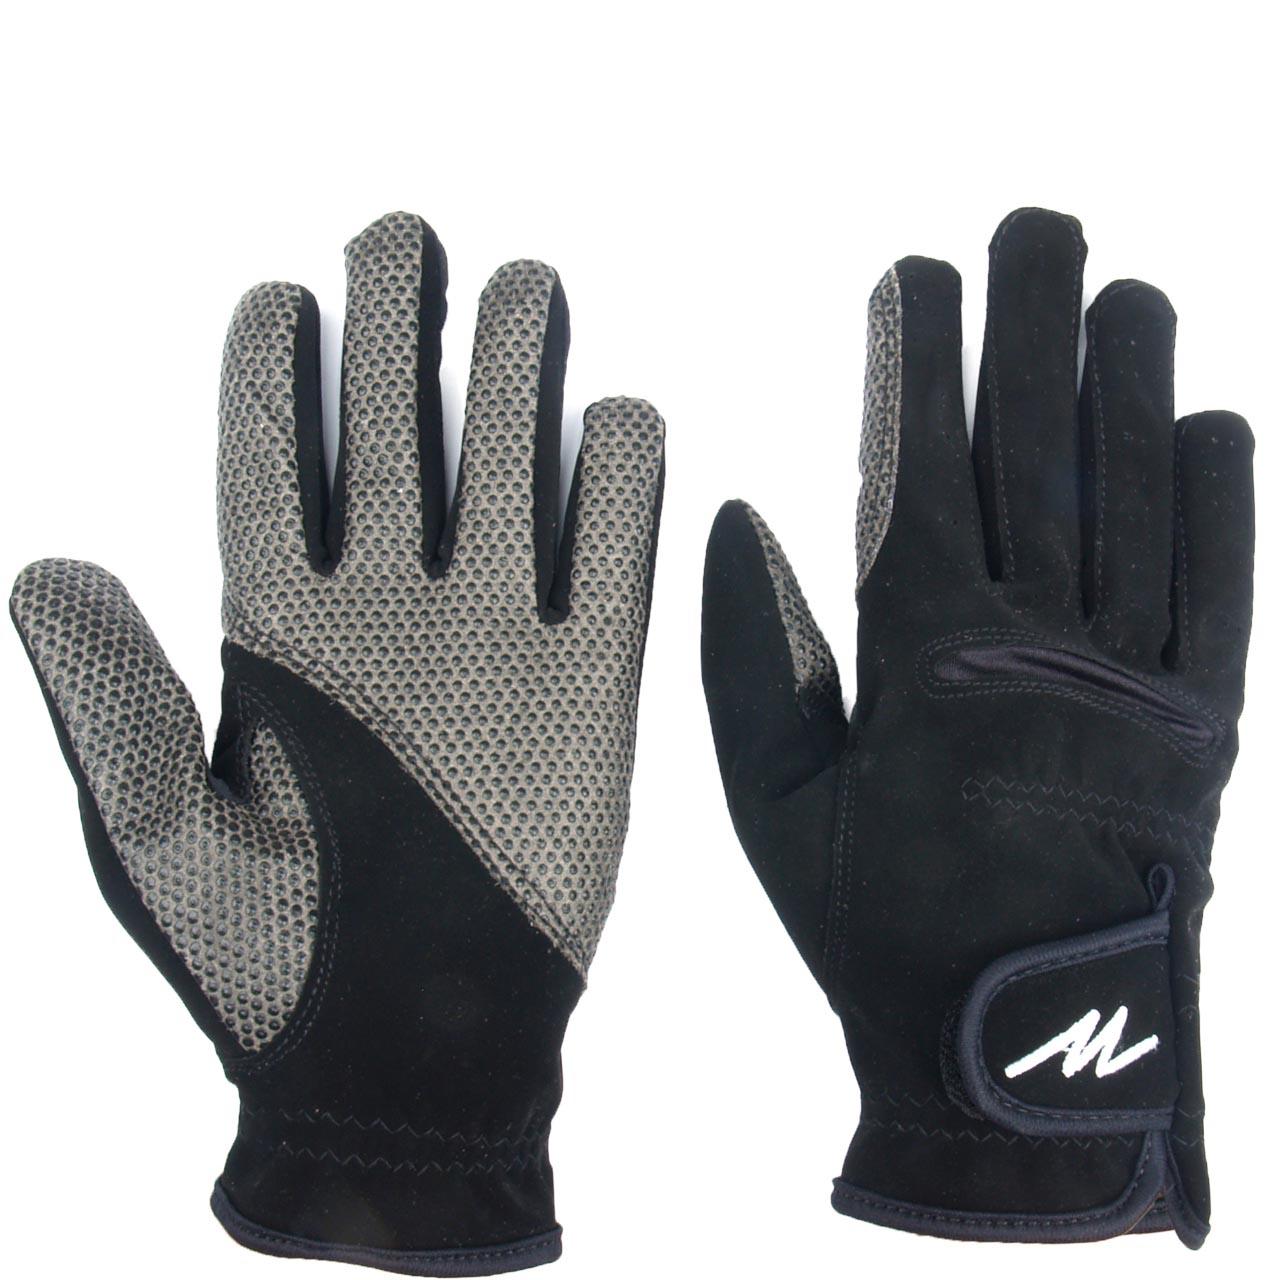 Mondoni Lima handschoen